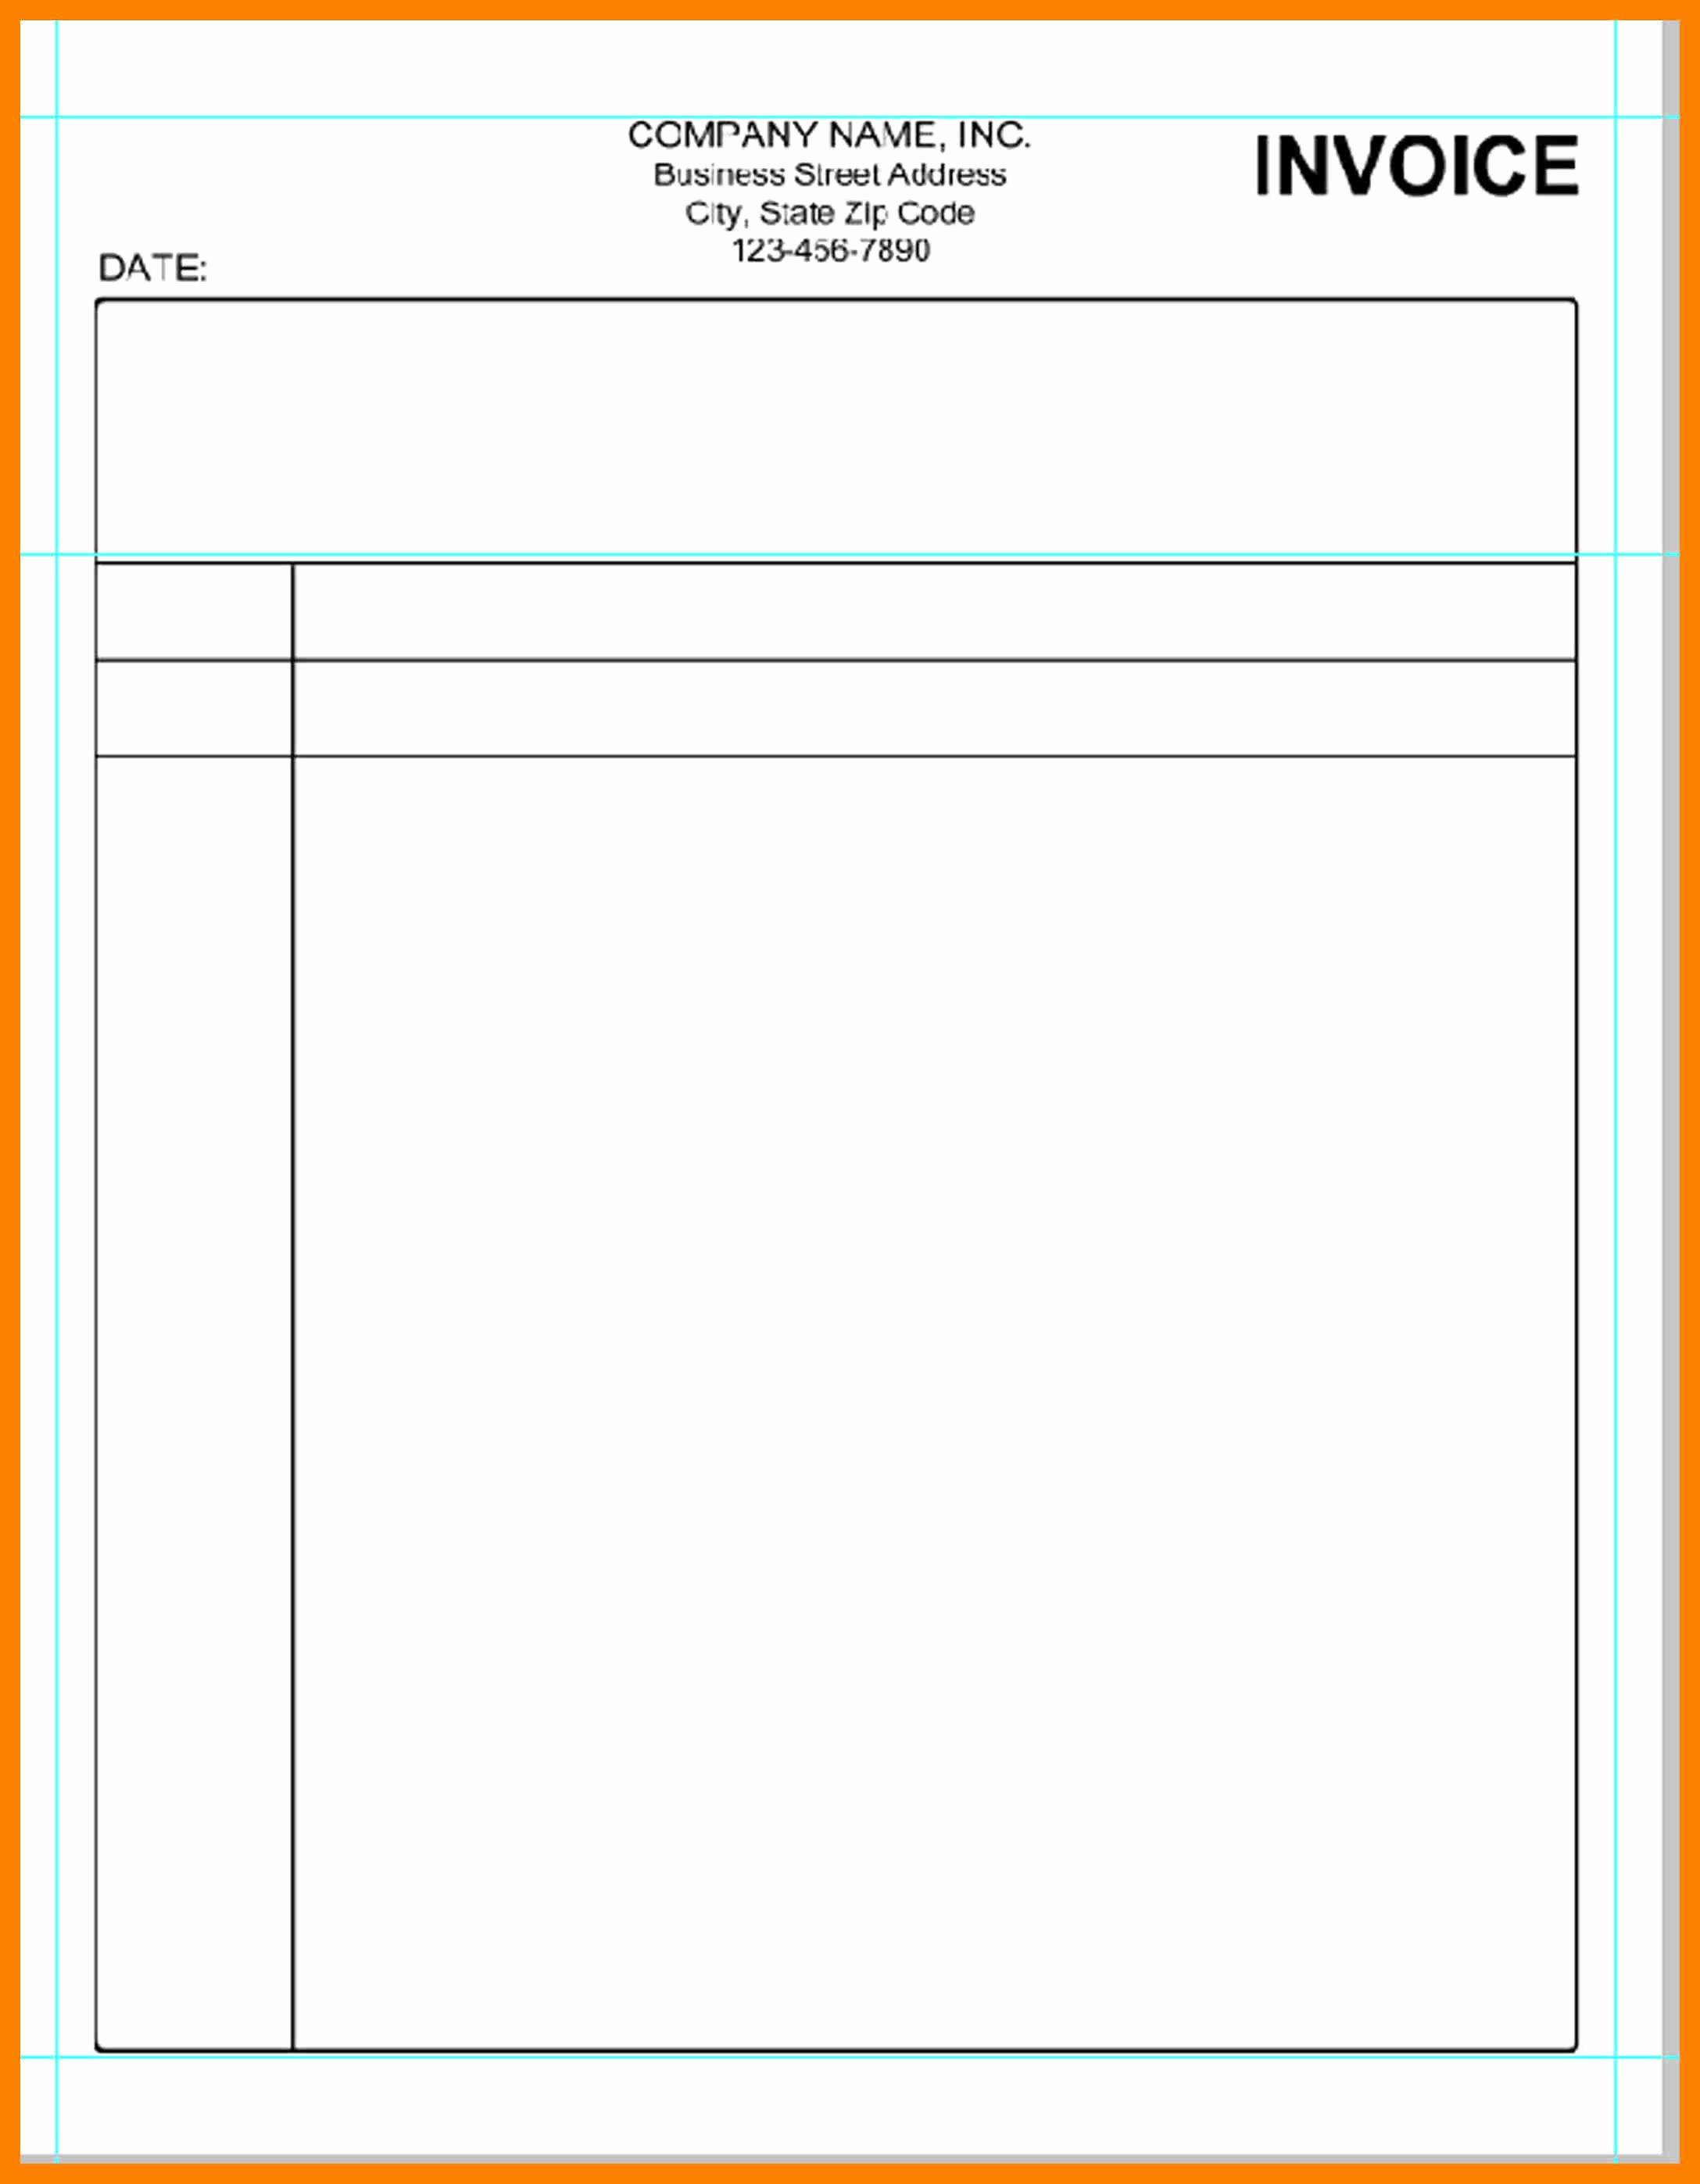 Invoice Blank Bamboodownunder